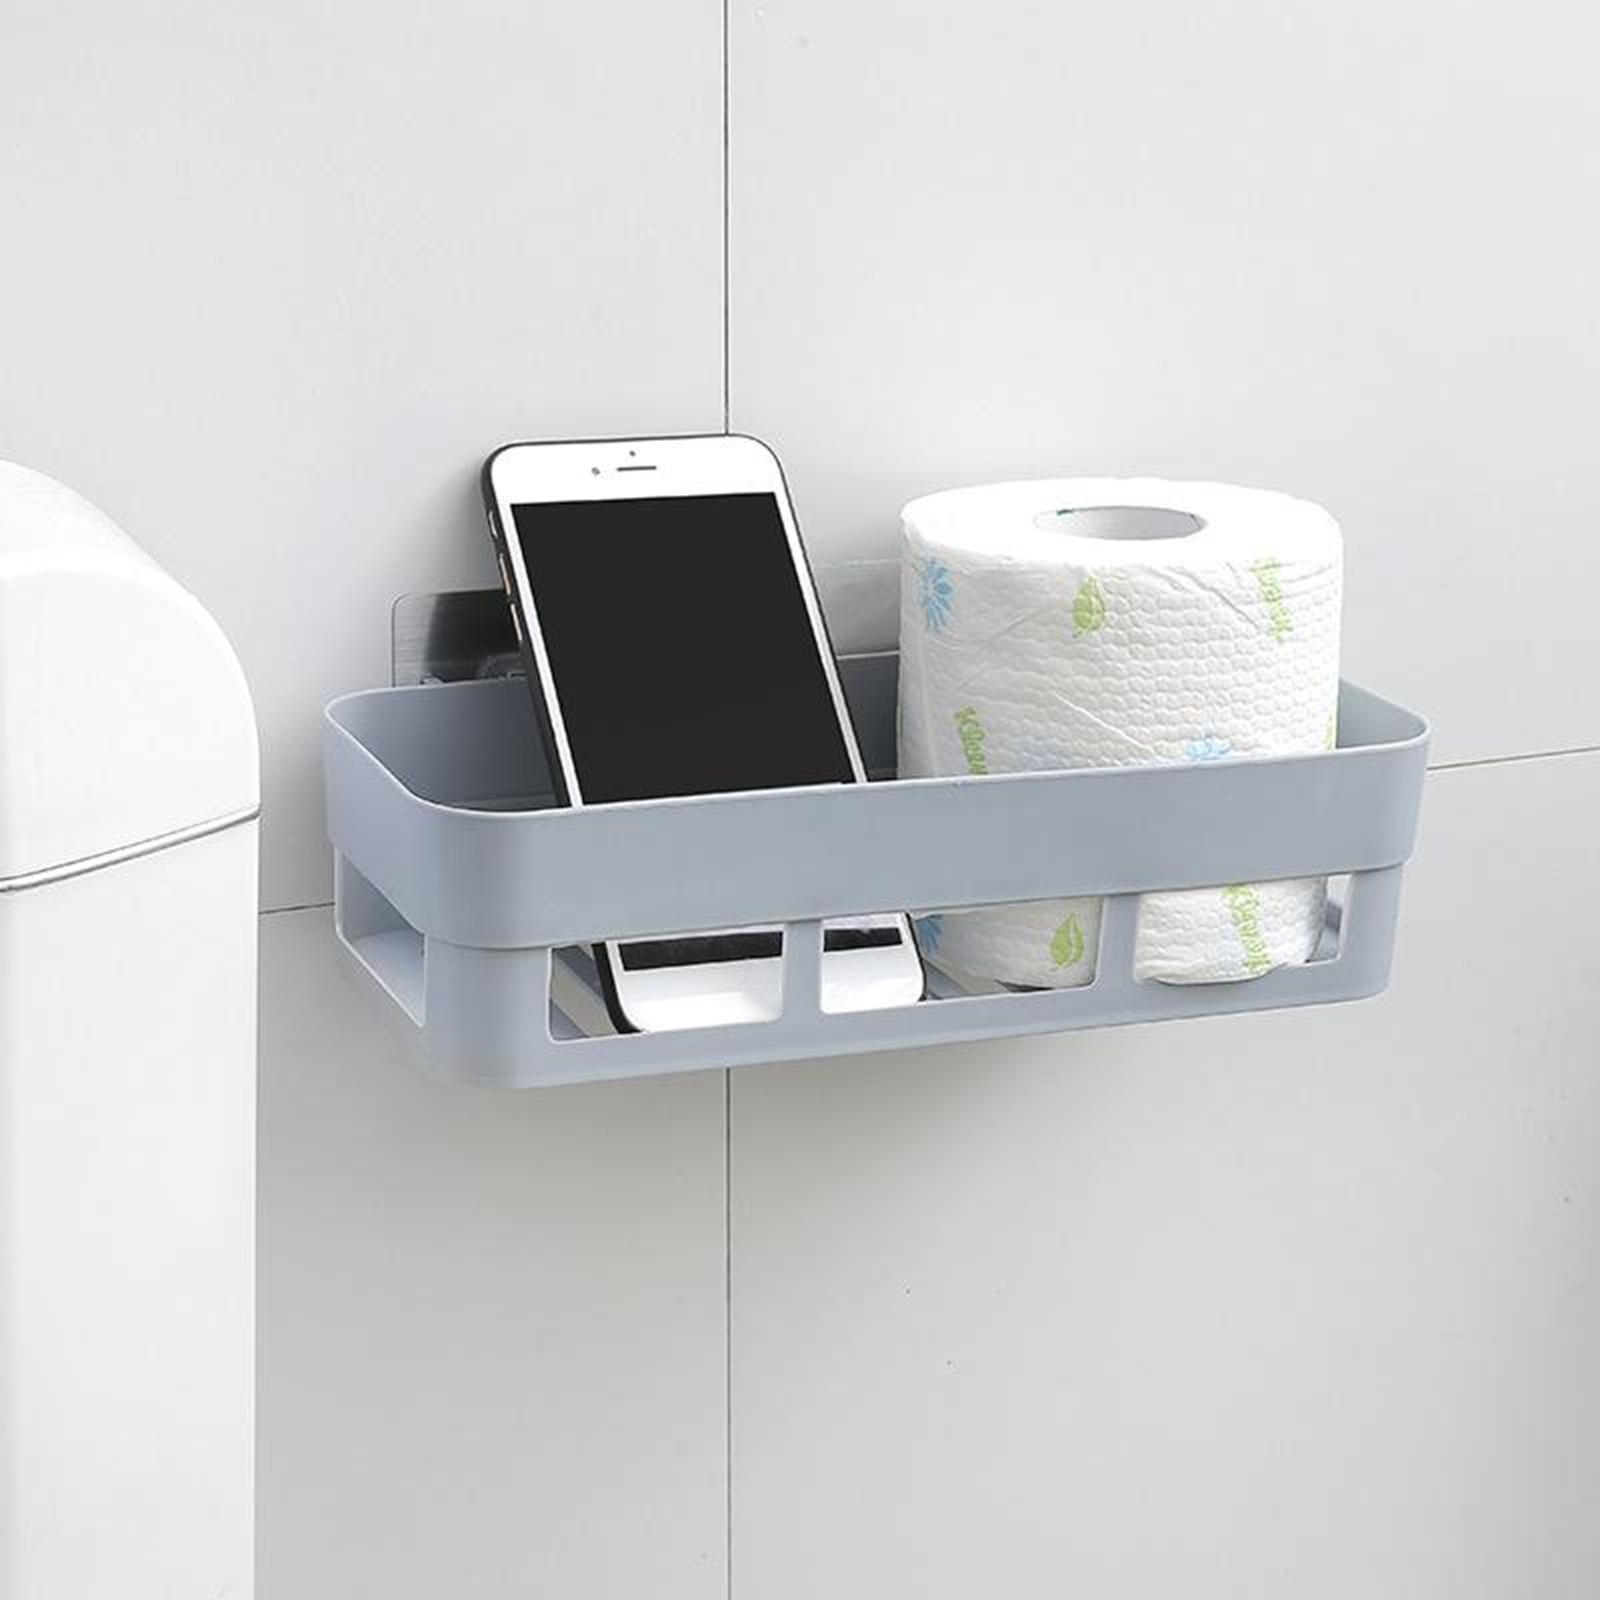 thumbnail 4 - Self-Adhesive-Shower-Shelf-Plastic-Shower-Caddy-Organiser-Bathroom-Shelf